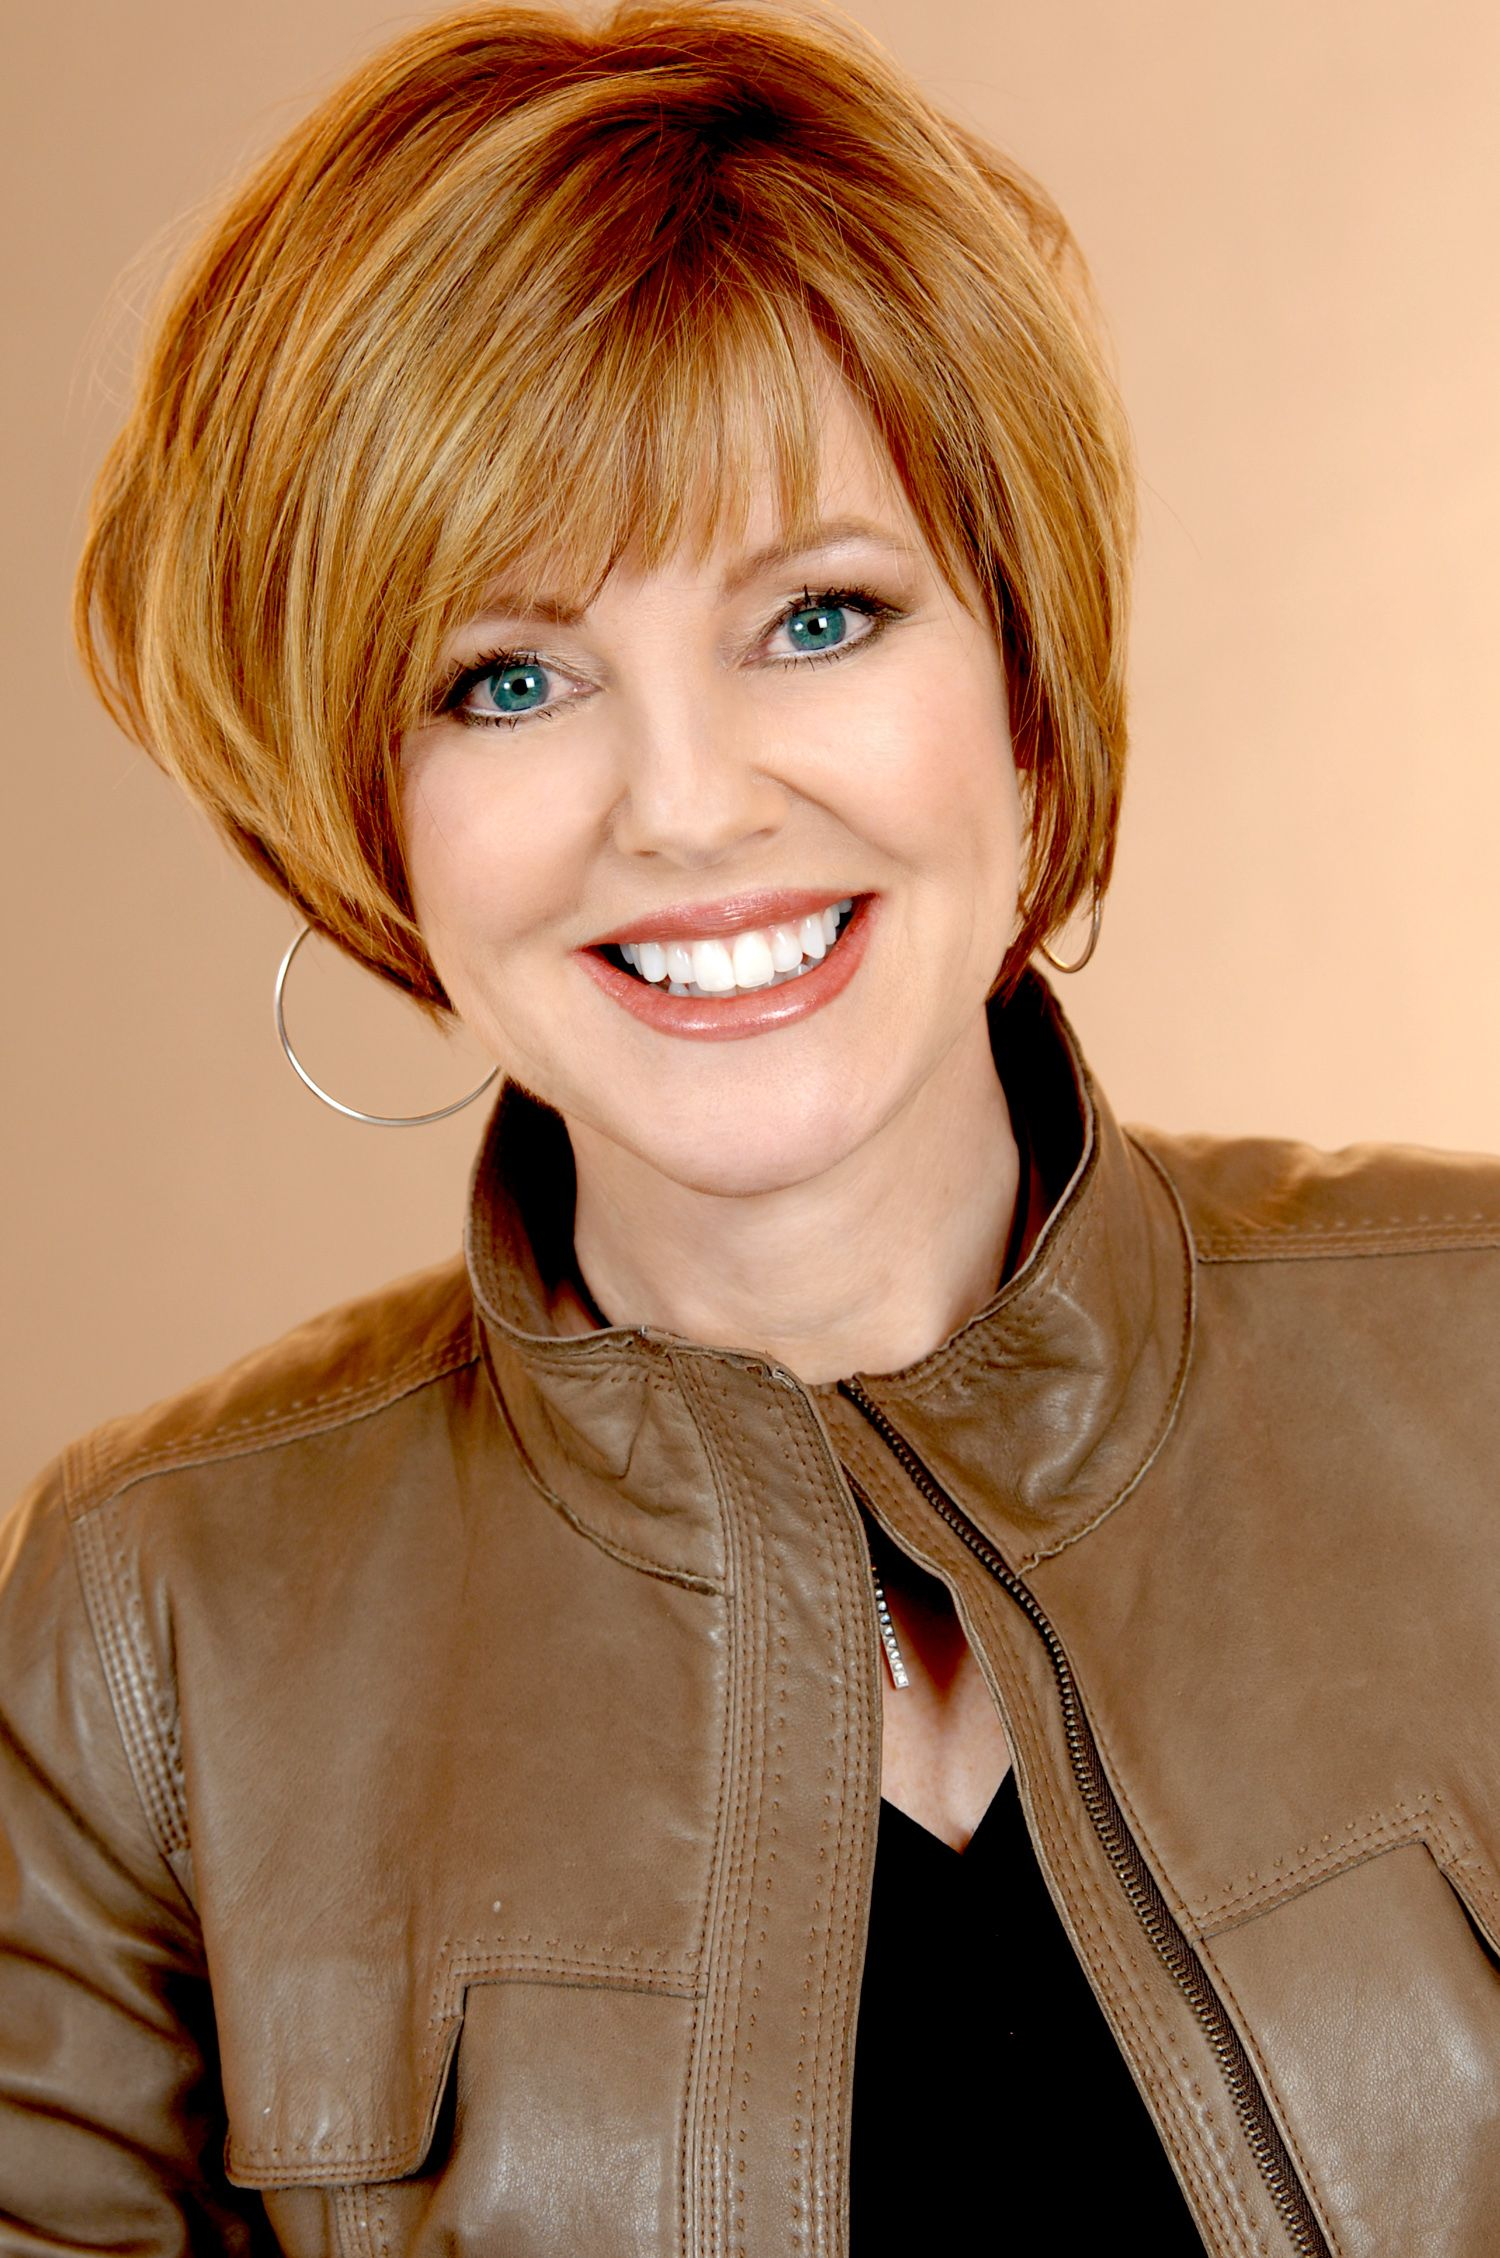 Patricia Lovett Reid Age 54